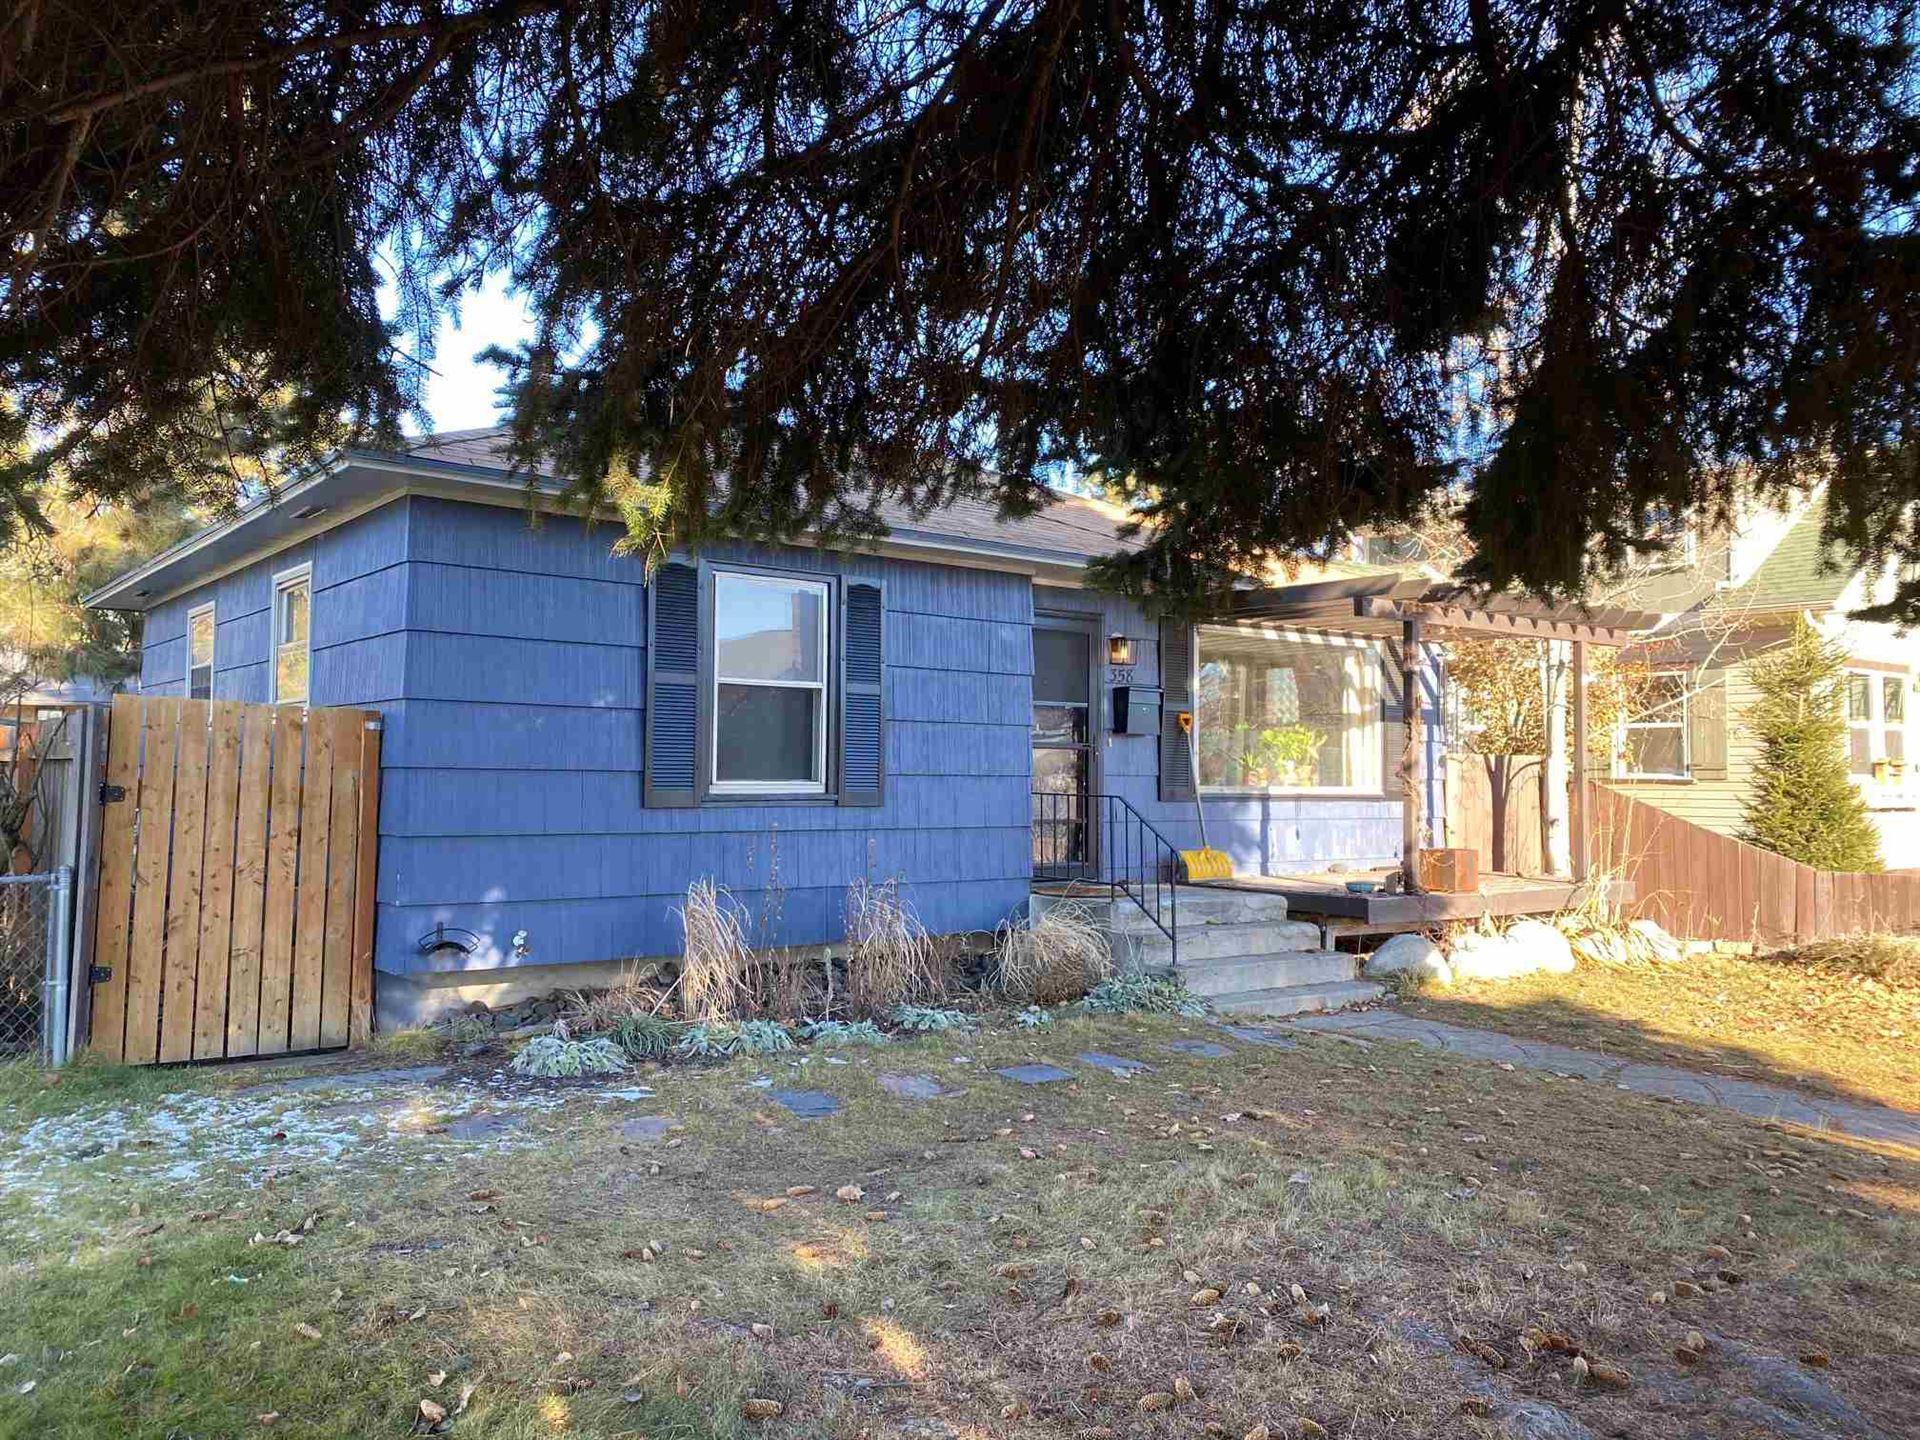 358 W Rowan Ave, Spokane, WA 99205-5125 - #: 202025321